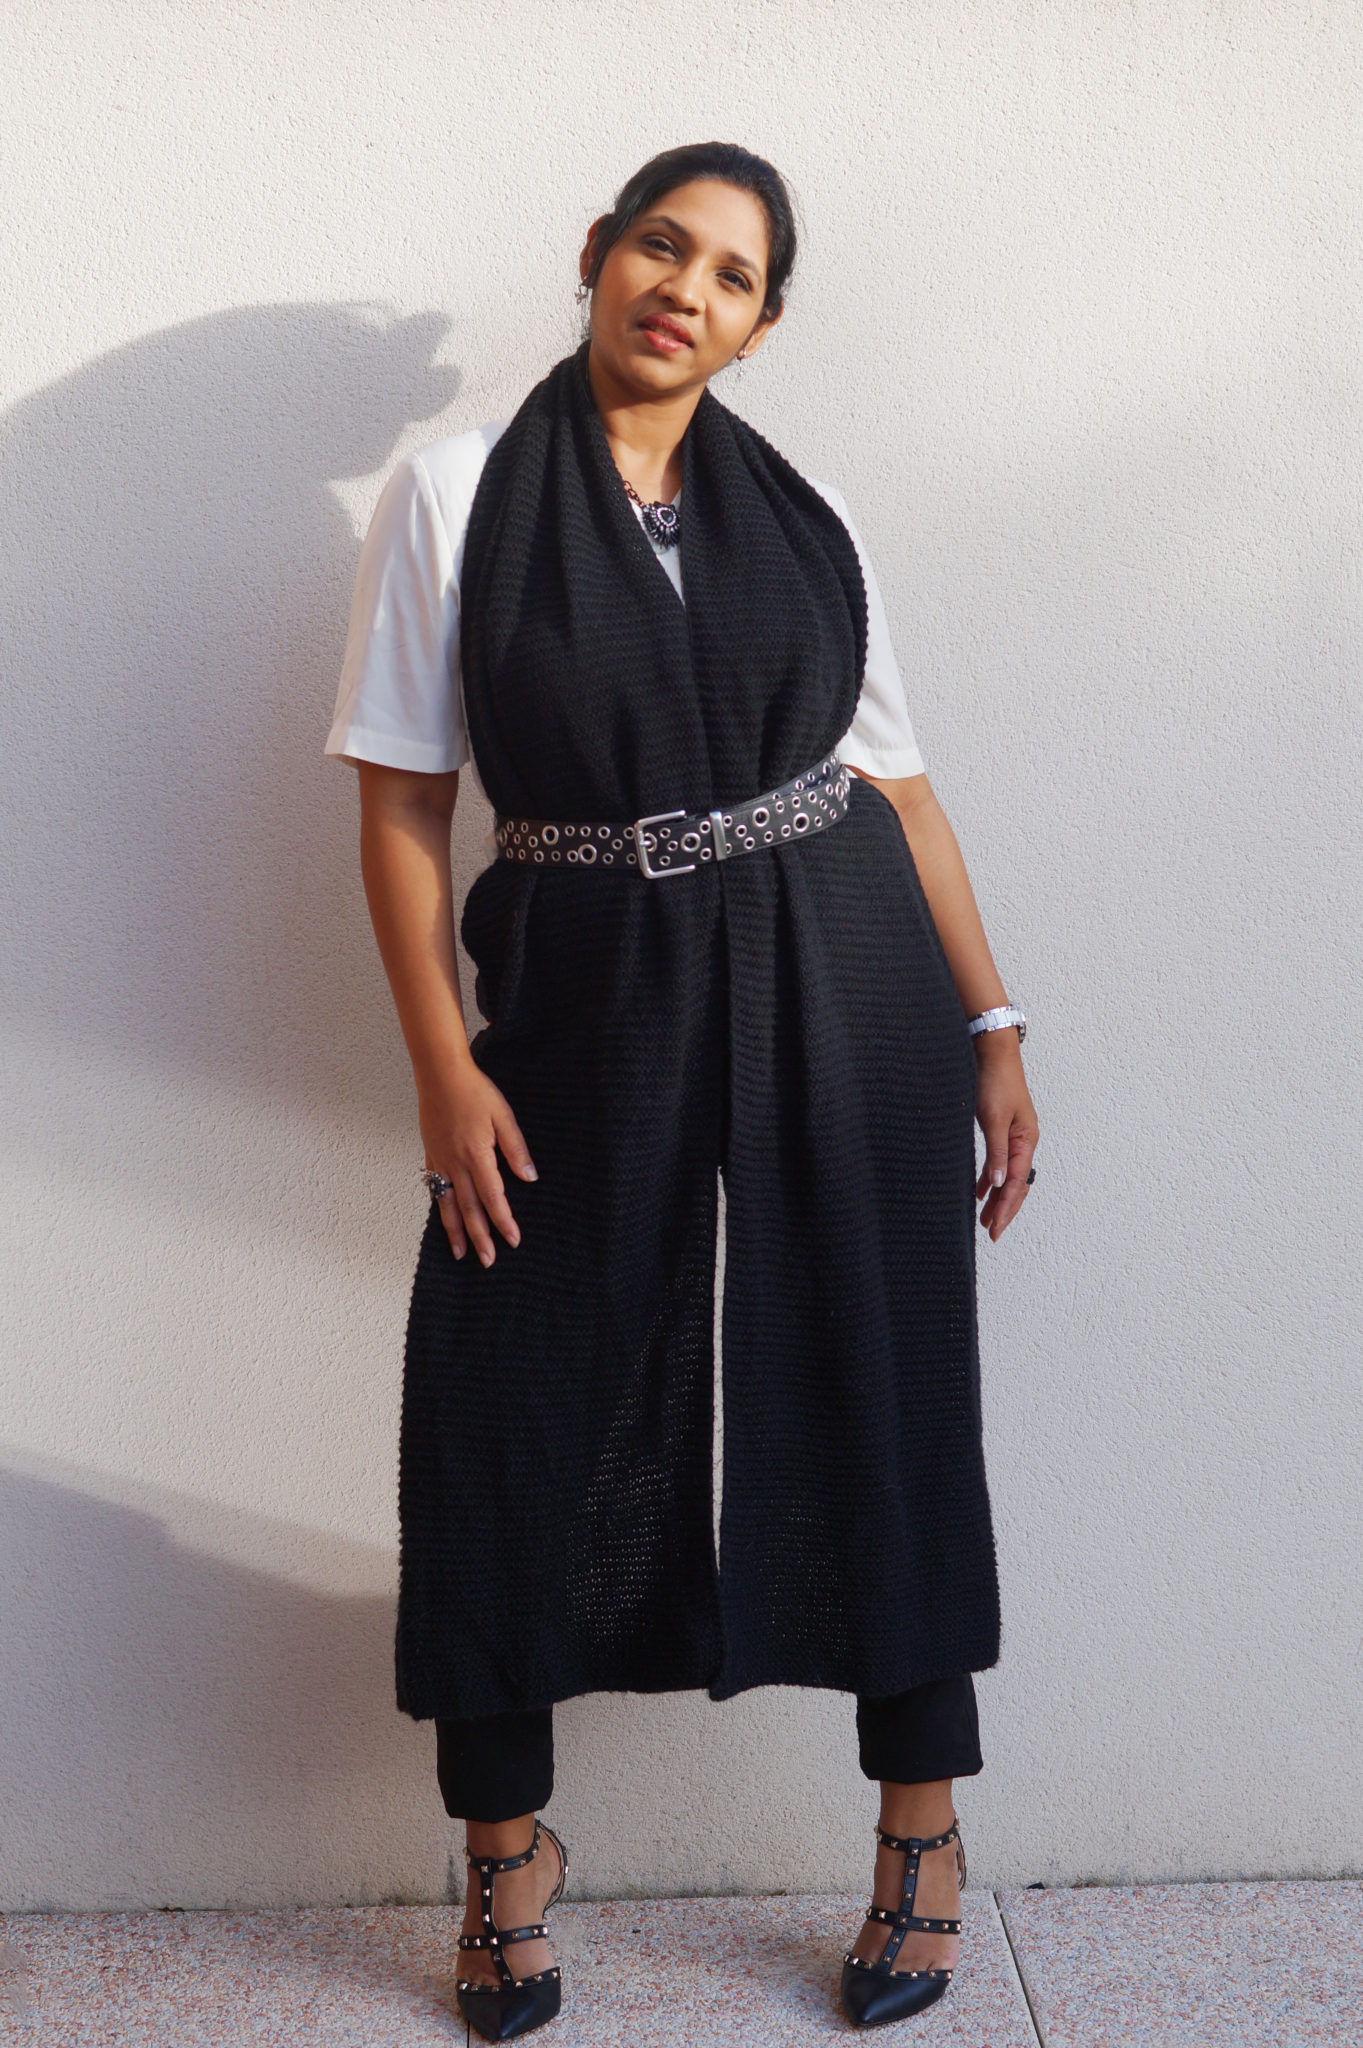 Hema_Minimalisme_blog_mode_look_fille5